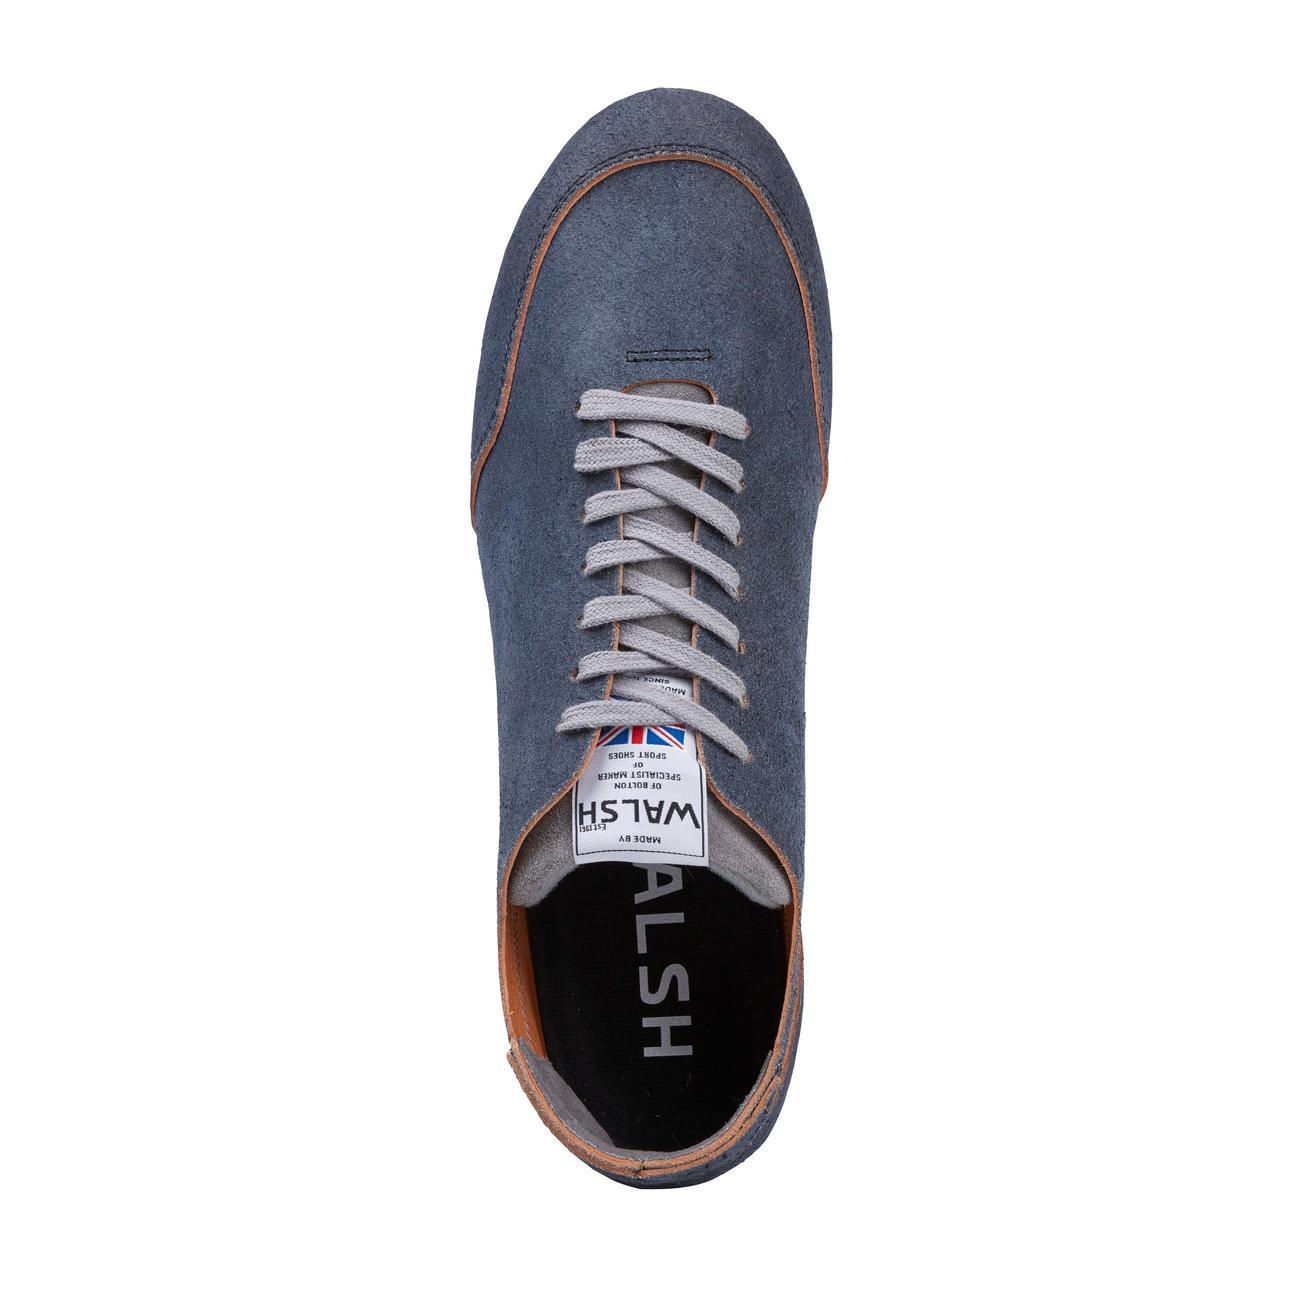 Chaussures De Sport En Cuir Norman Walsh Pieds Nus, 41 - Gris / Bleu